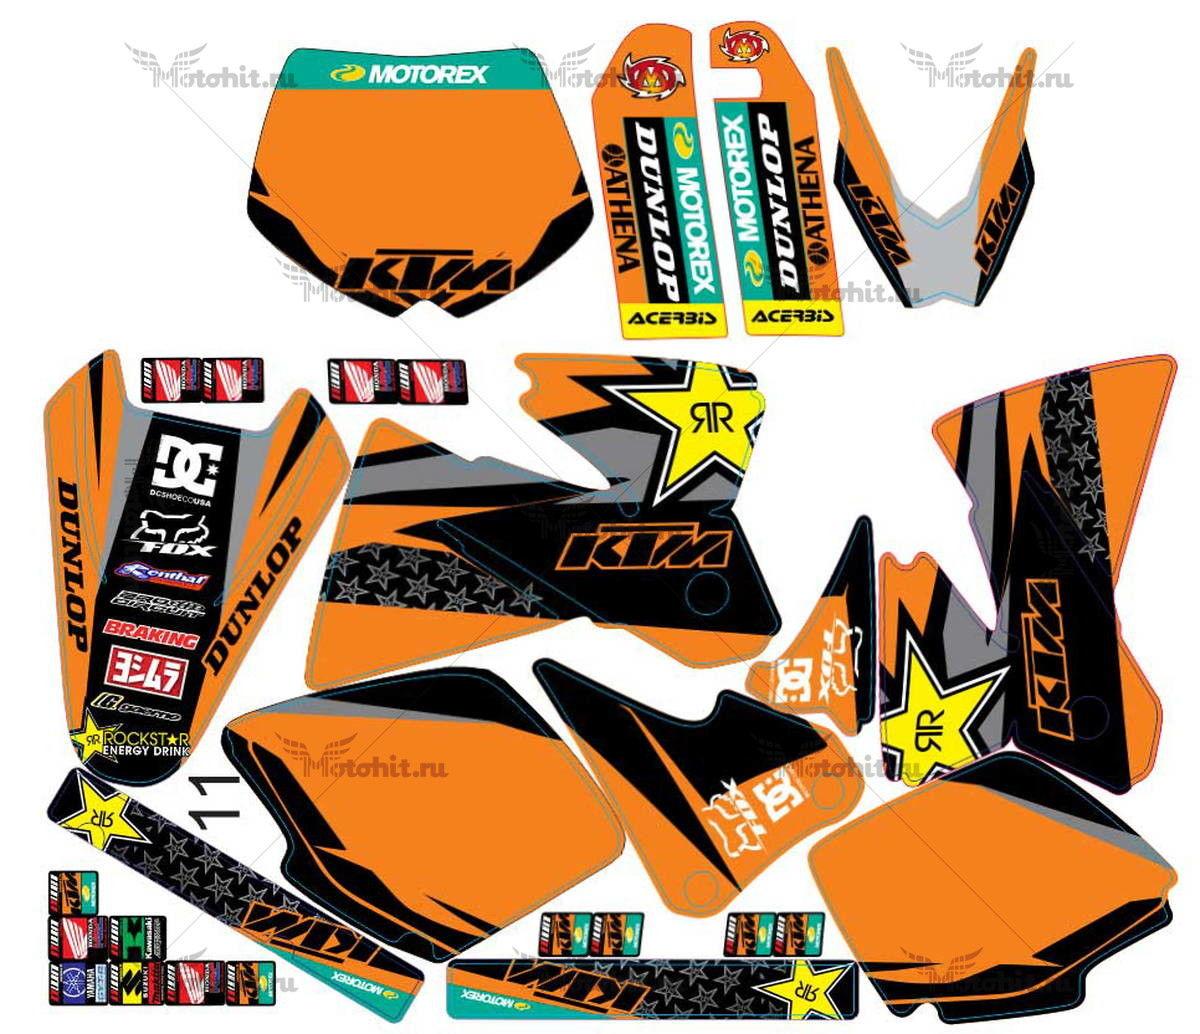 Комплект наклеек KTM EXC-520 2000 ROCK-STAR-PILNAS2